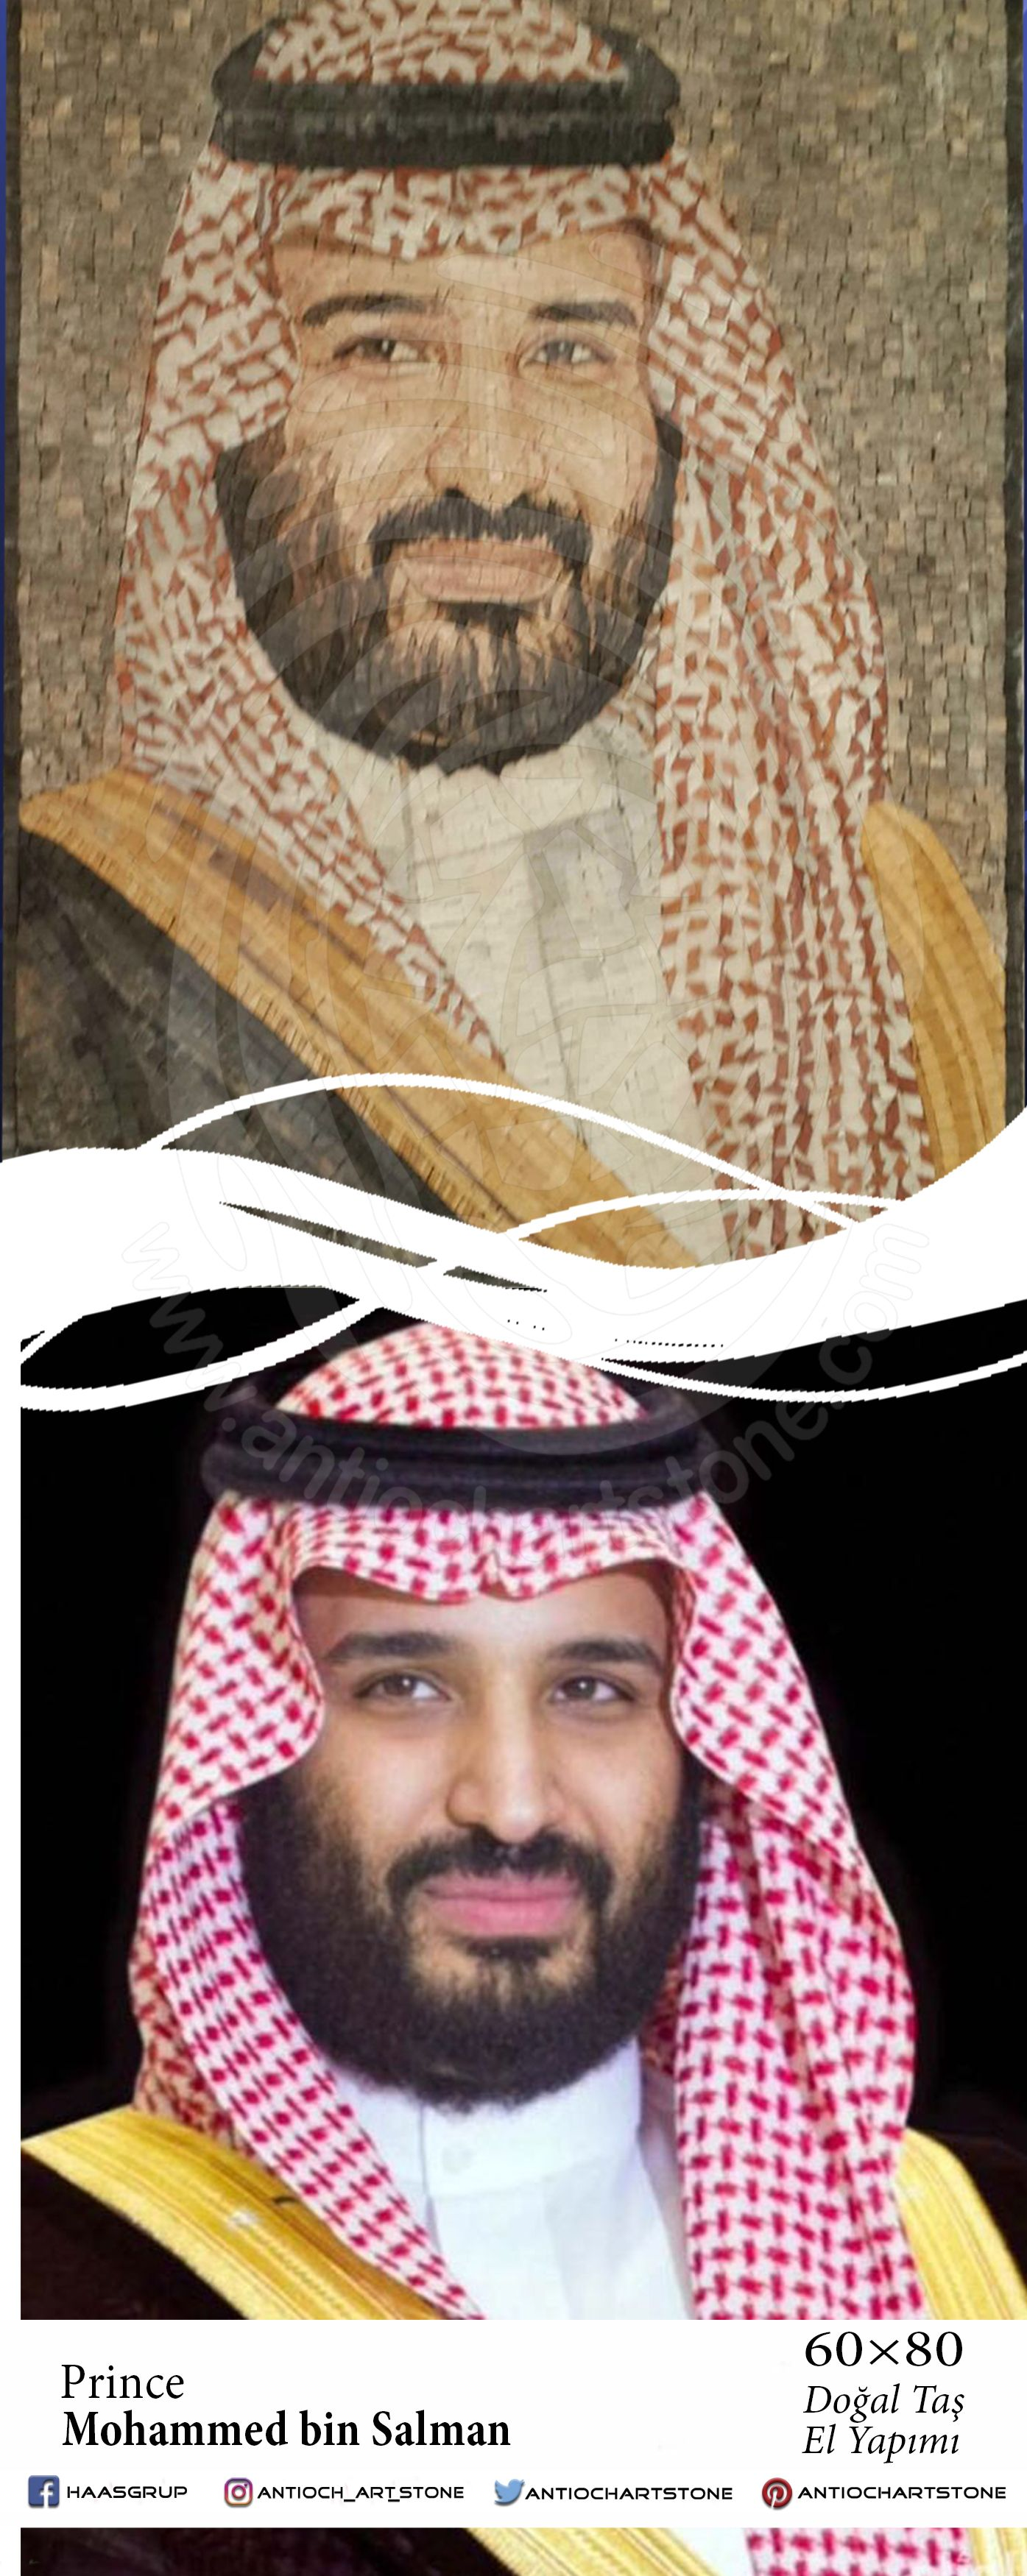 Prince Mohammed Bin Salman الامير محمد بن سلمان فسيفساء حجر طبيعي رسم فن لوحات ديكور Figures Antioch